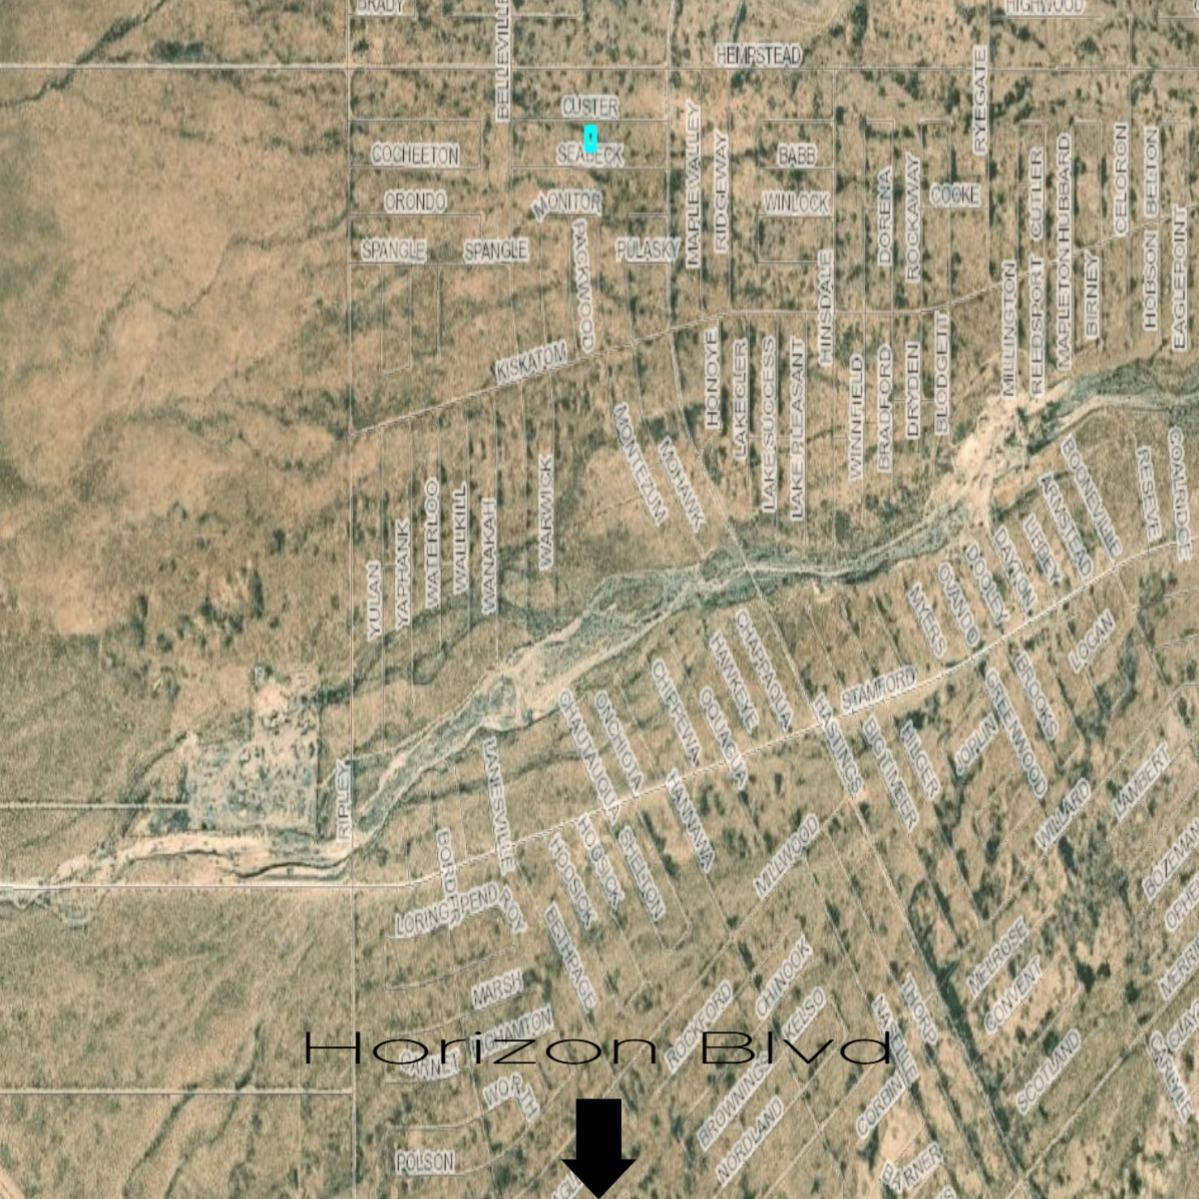 0 Custer, Horizon City, Texas 79928, ,Land,For sale,Custer,839439